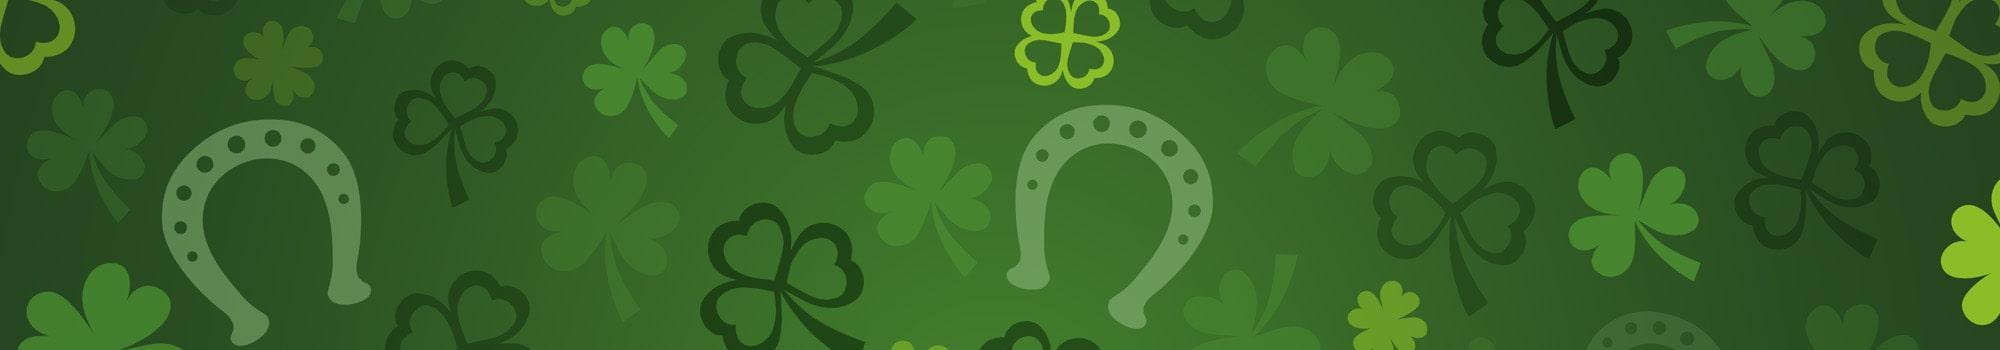 St. Patrick's Day | Long Beach | LB Brew Crew